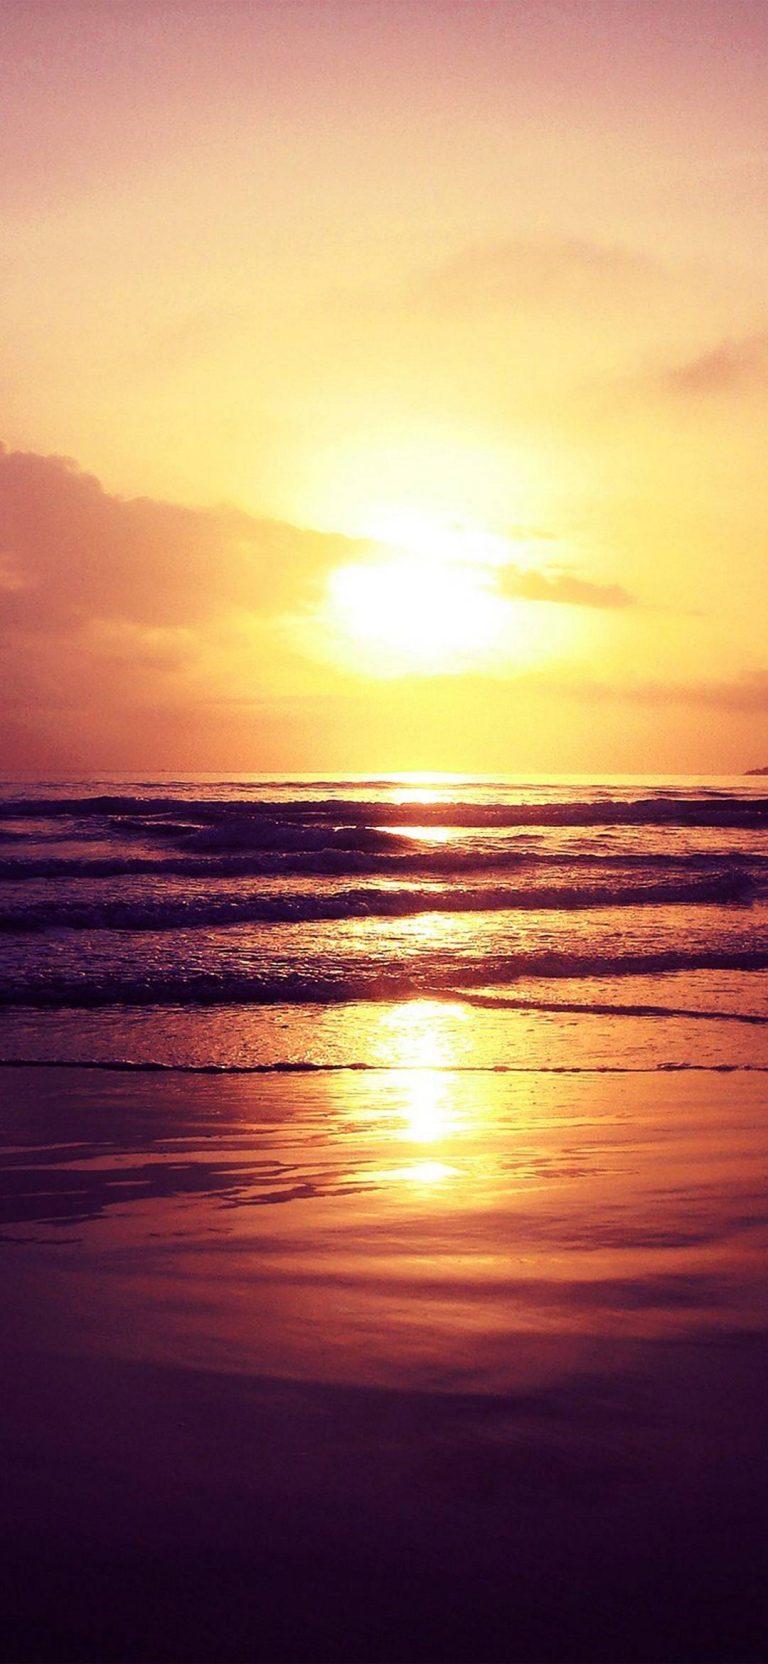 Beach Sunset 1080x2340 768x1664